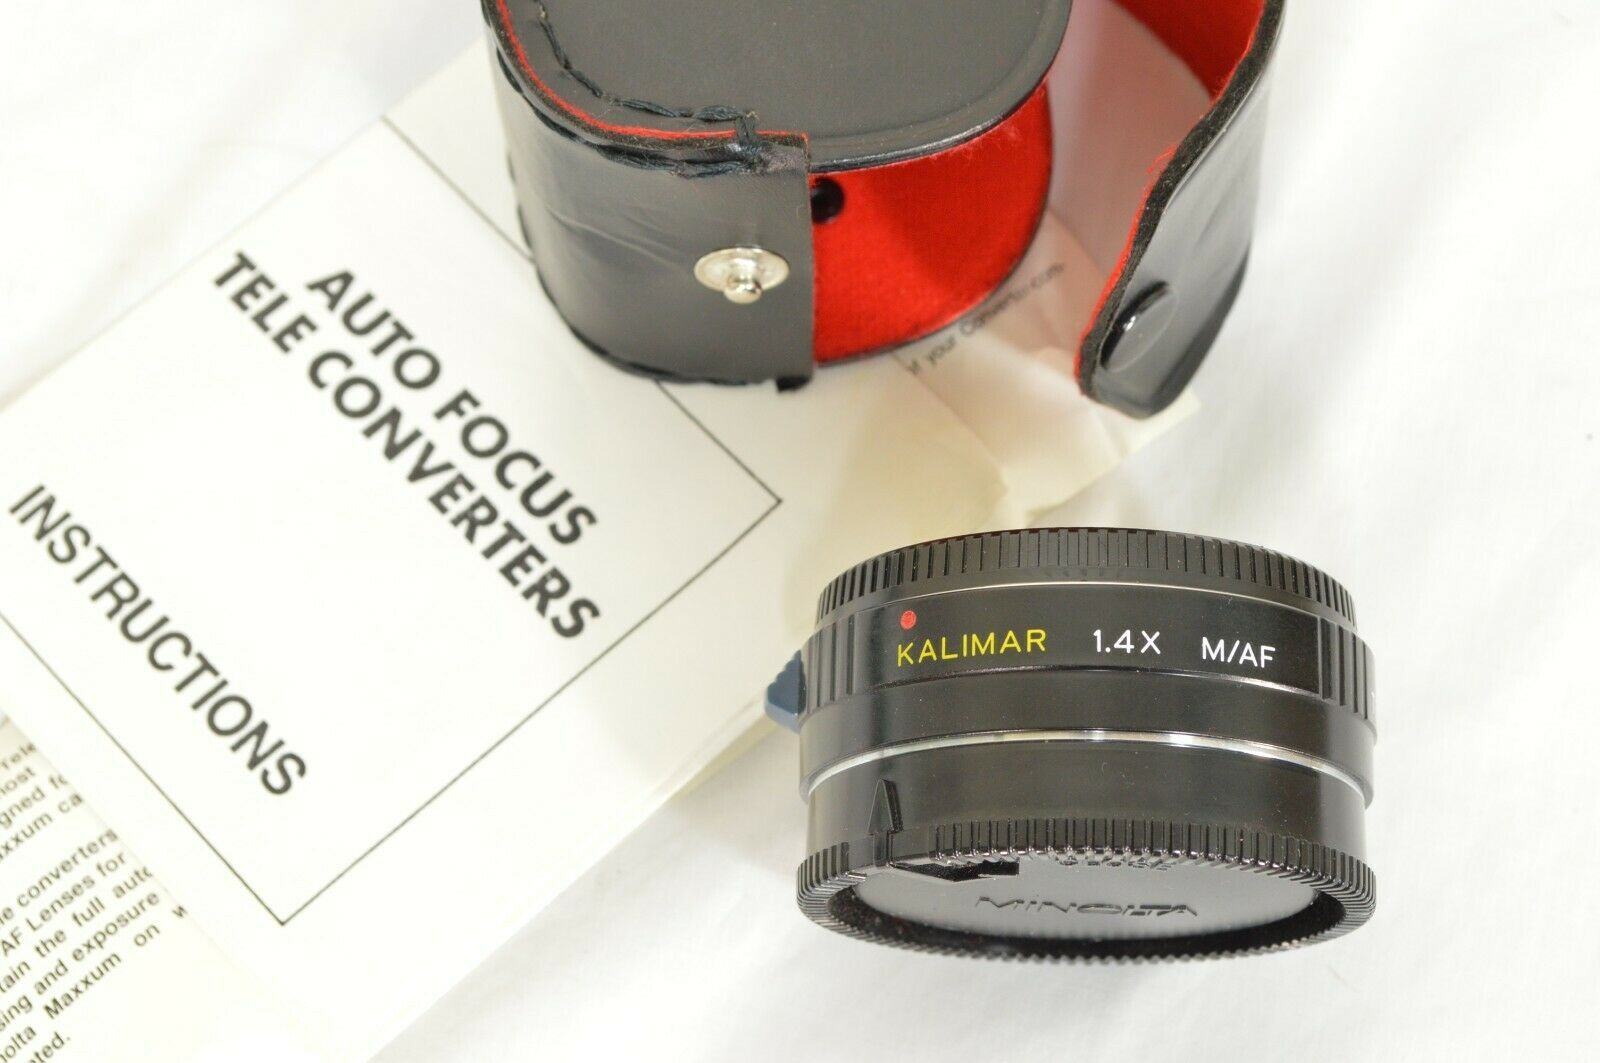 Kalimar 1.4 X M/AF Tele Converter Auto Focus camera lens w/ case & instructions